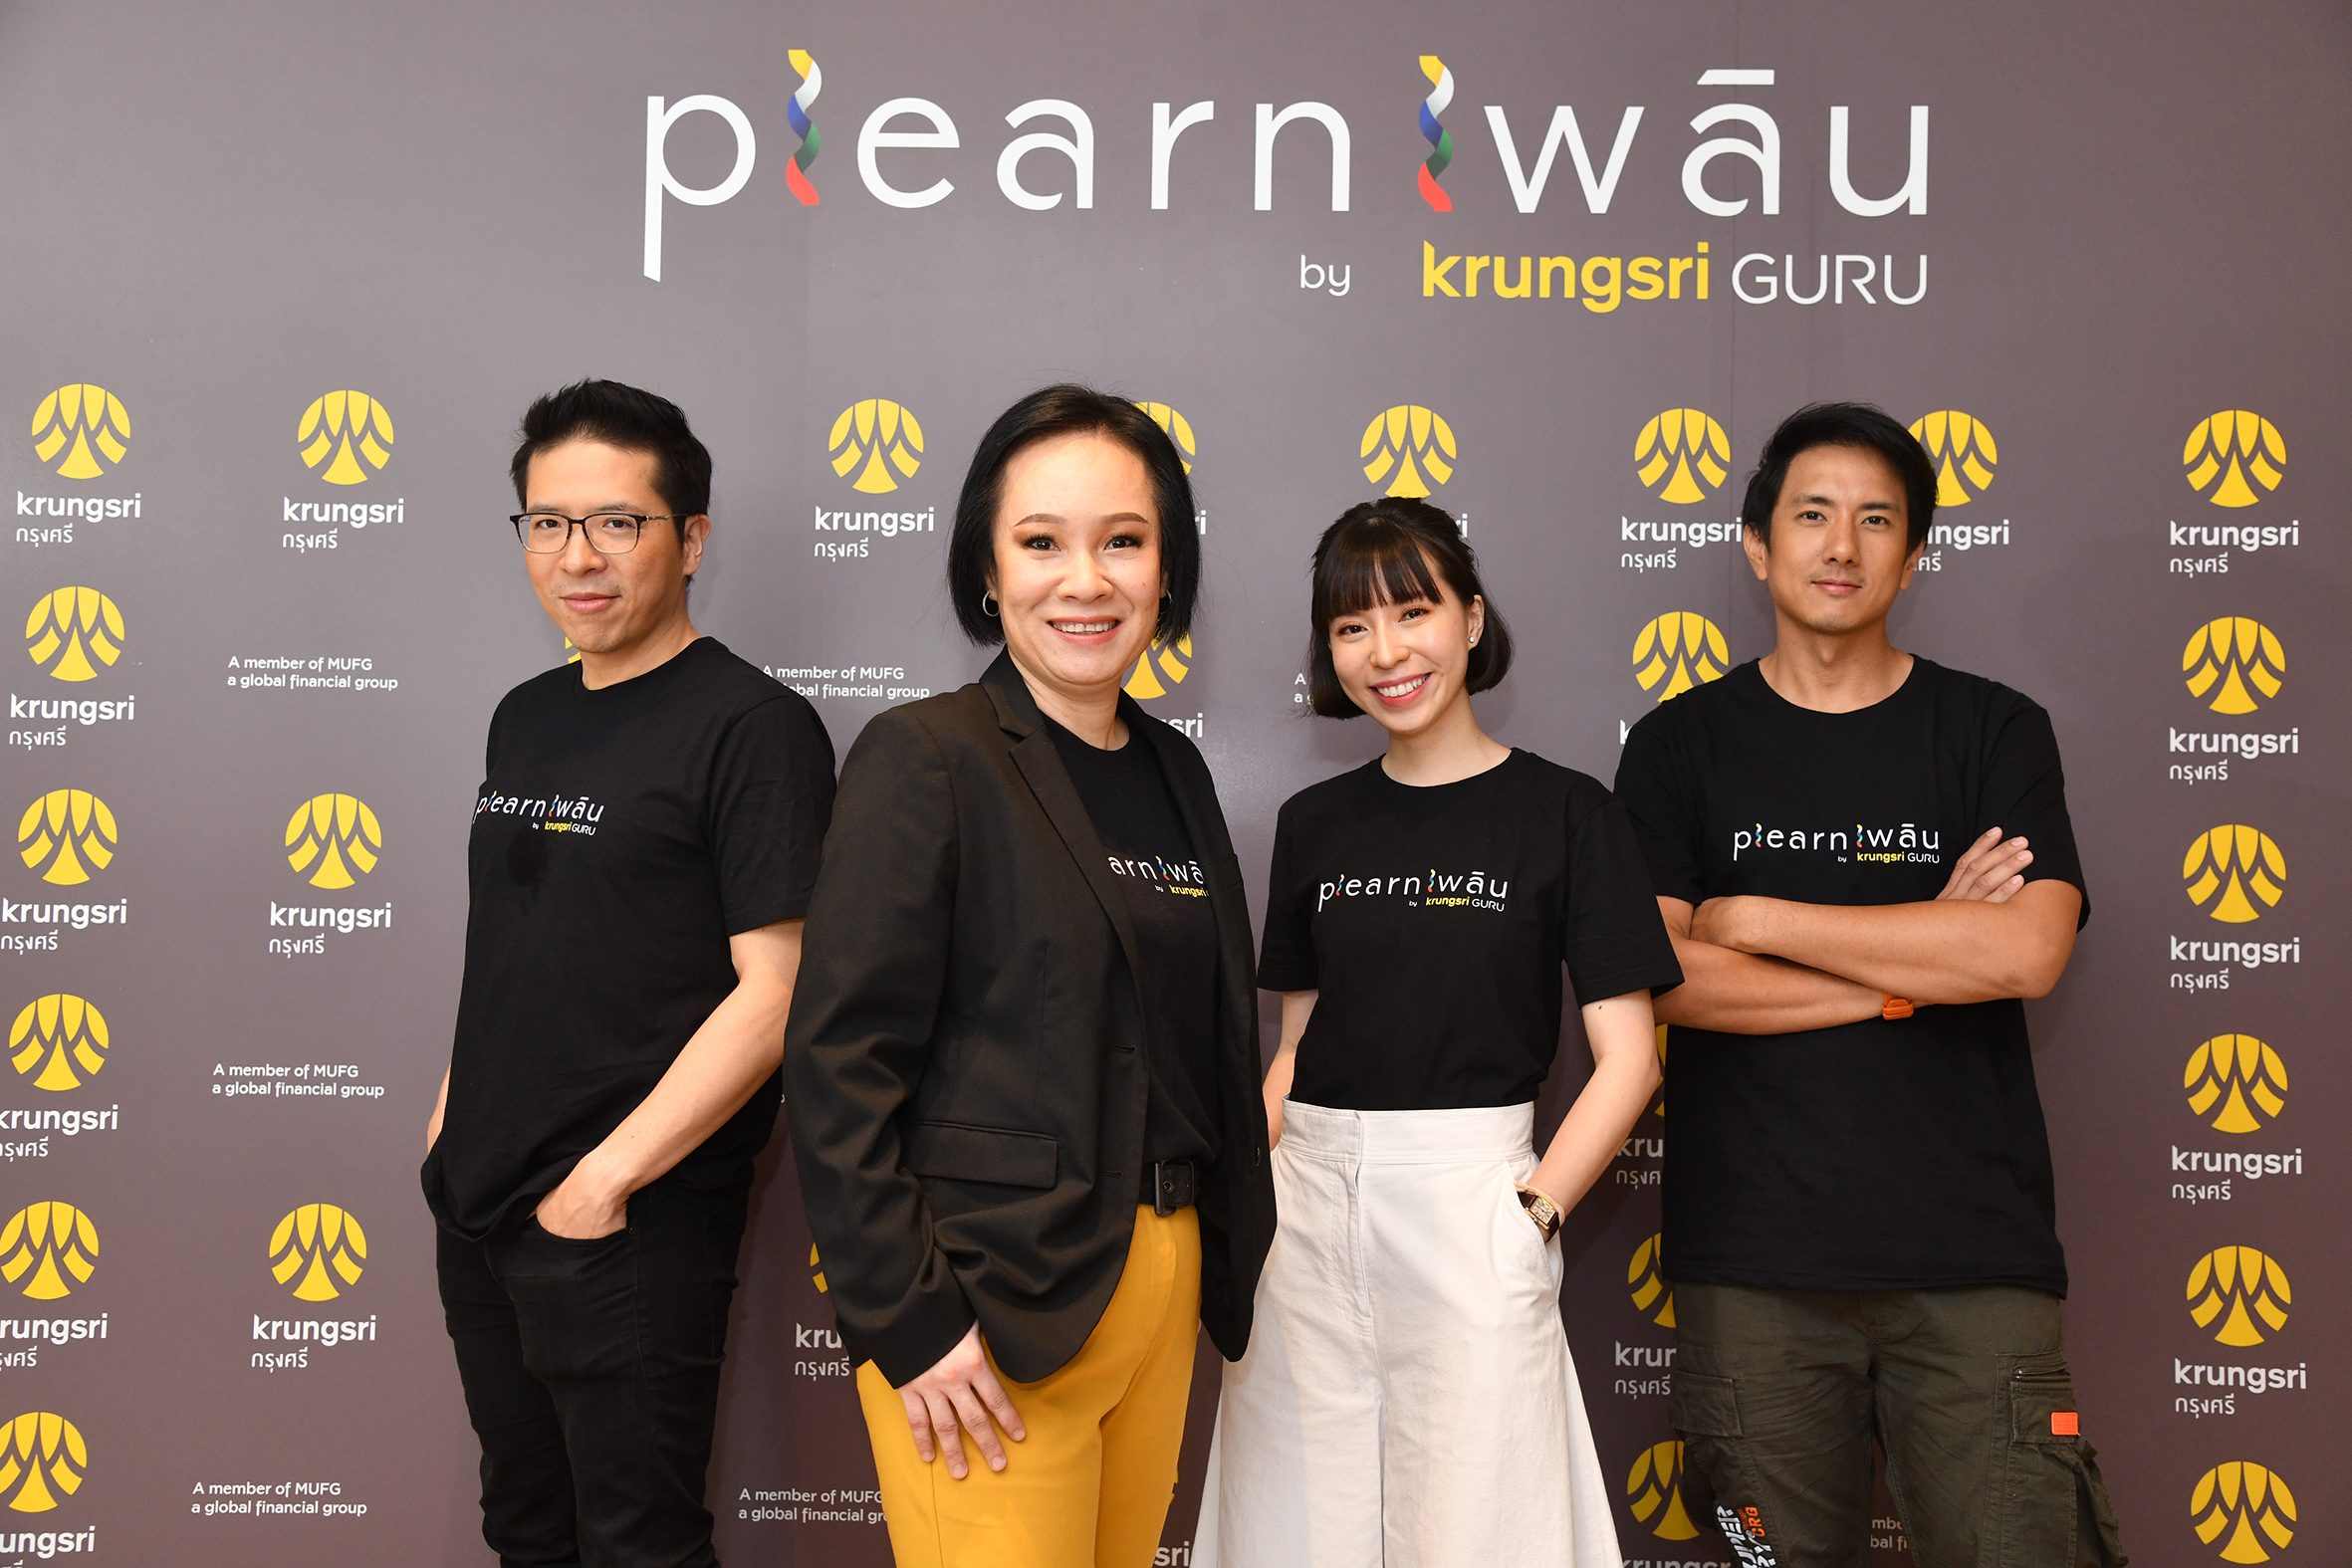 """Plearn เพลิน By Krungsri GURU"" คอนเทนต์ฮับออนไลน์เสิร์ฟสาระคู่ไลฟ์สไตล์"